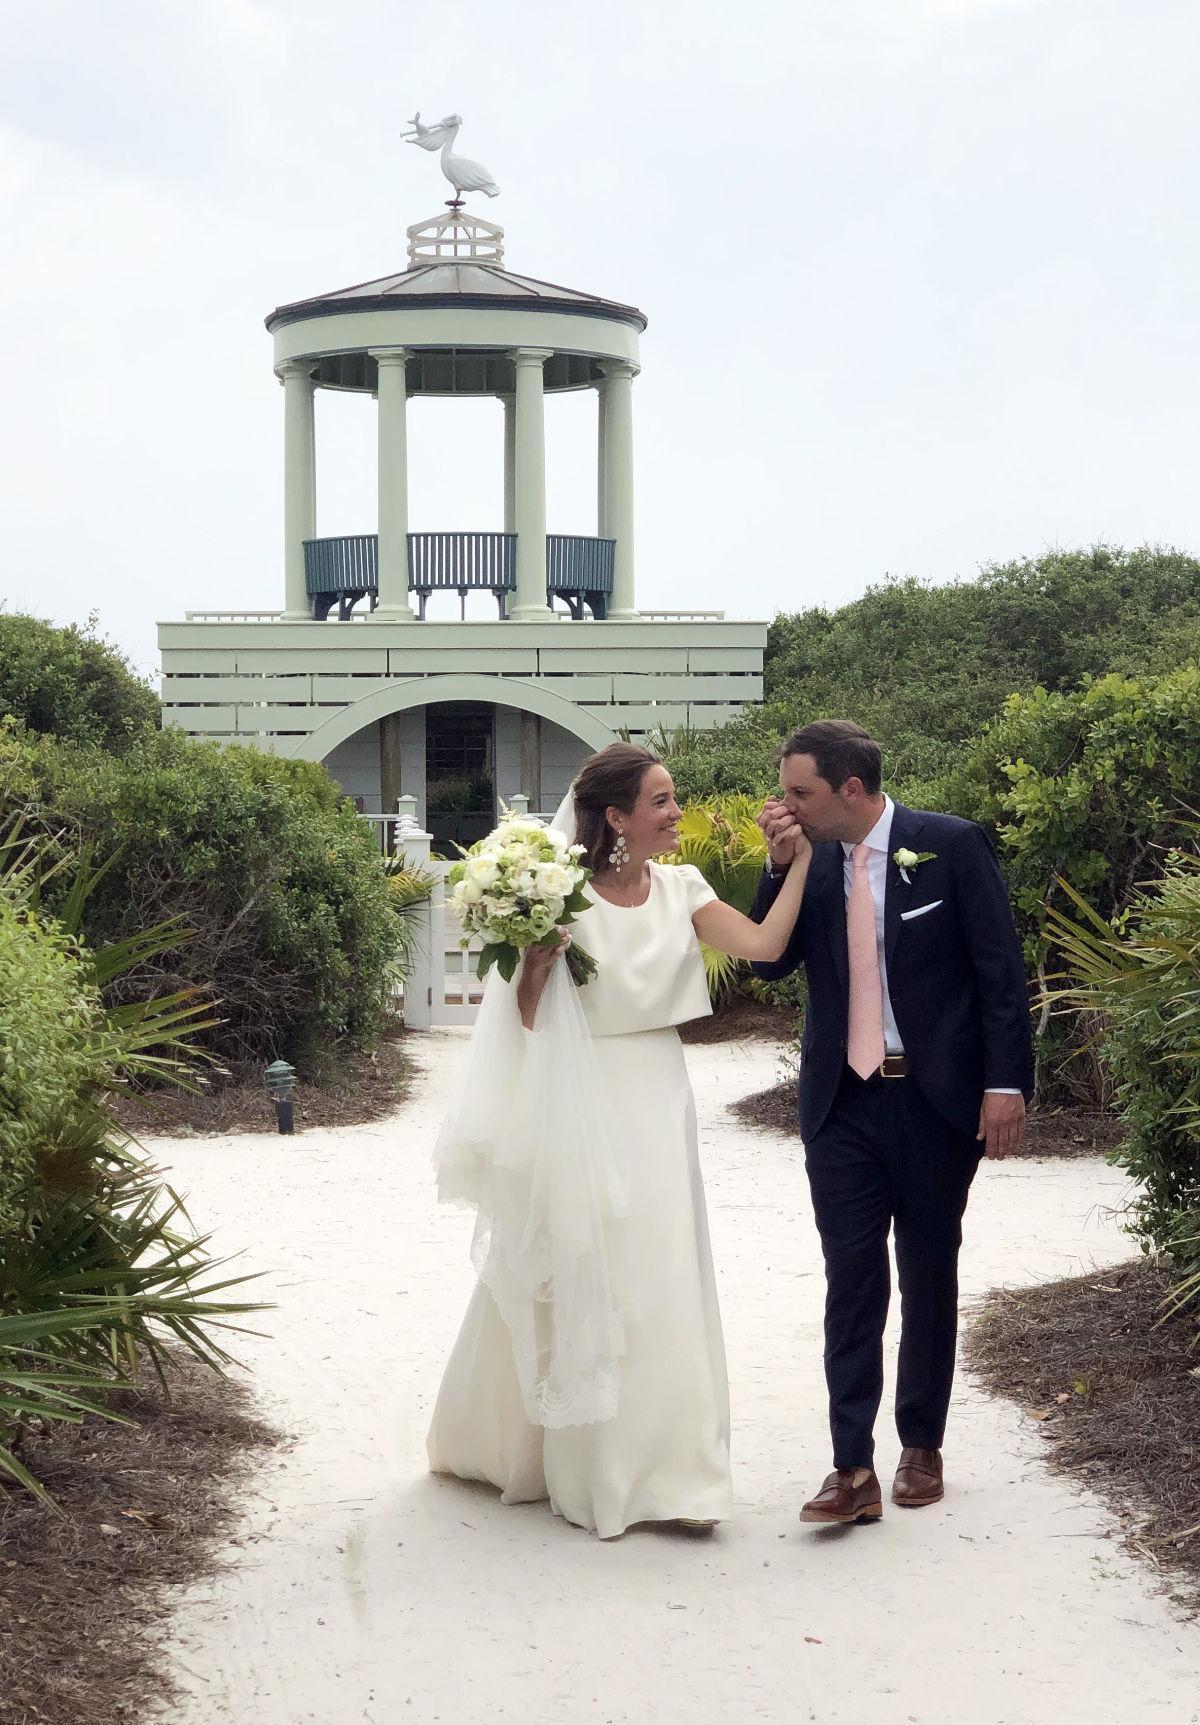 Mary Elizabeth Adams and Scott Grant exchange vows in Seaside - 1